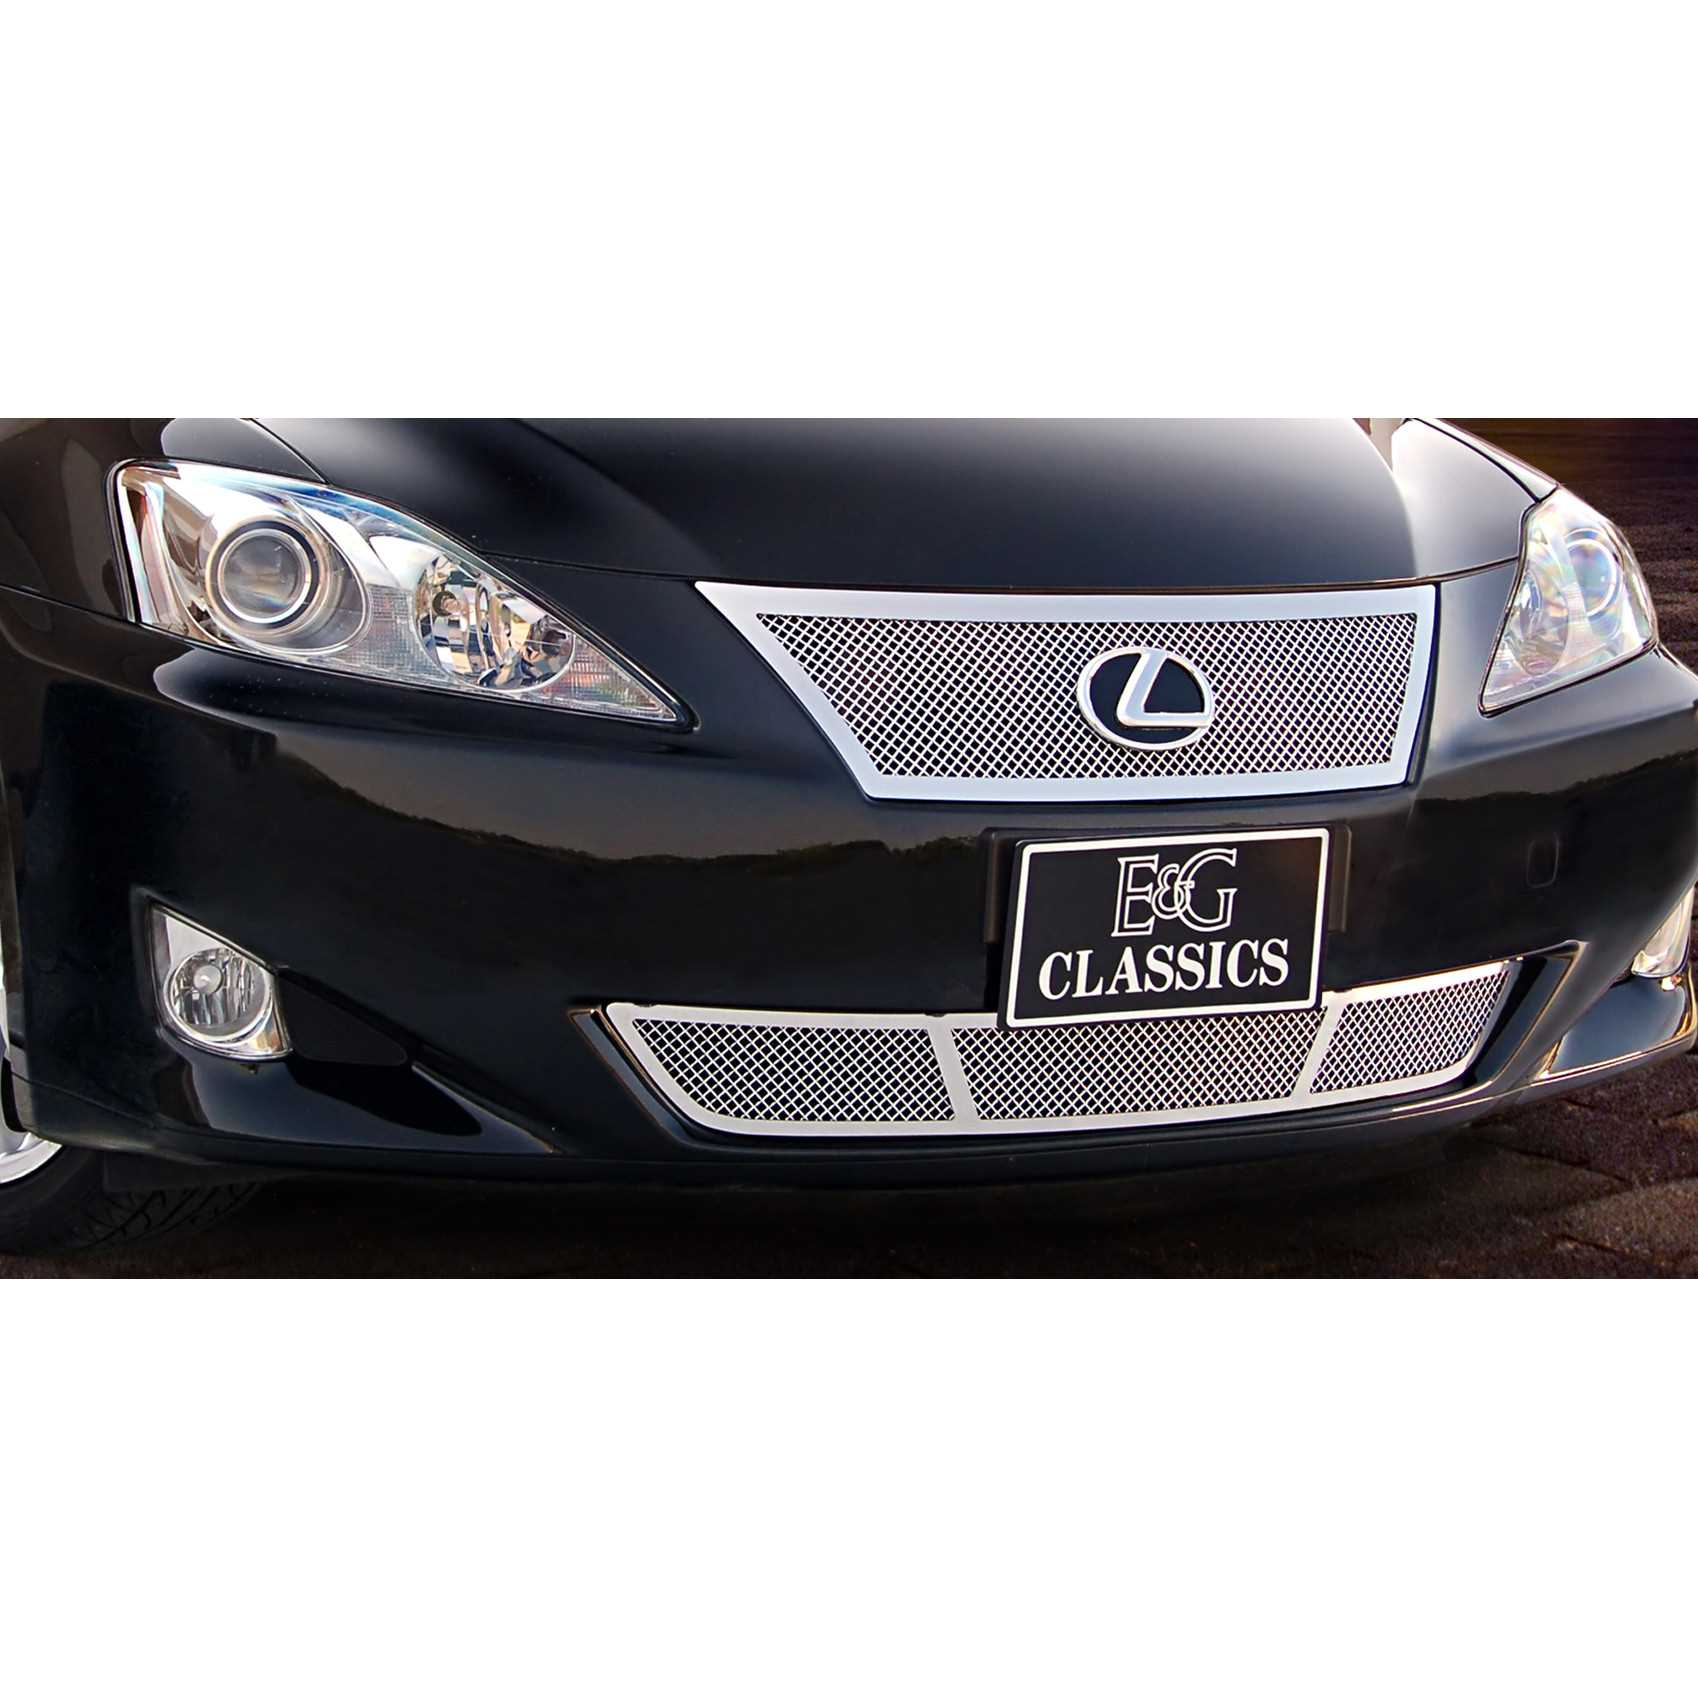 2008 Lexus Is 250 Price: E&G Classics 2006-2008 Lexus IS 250/350 Grille 2Pc Fine